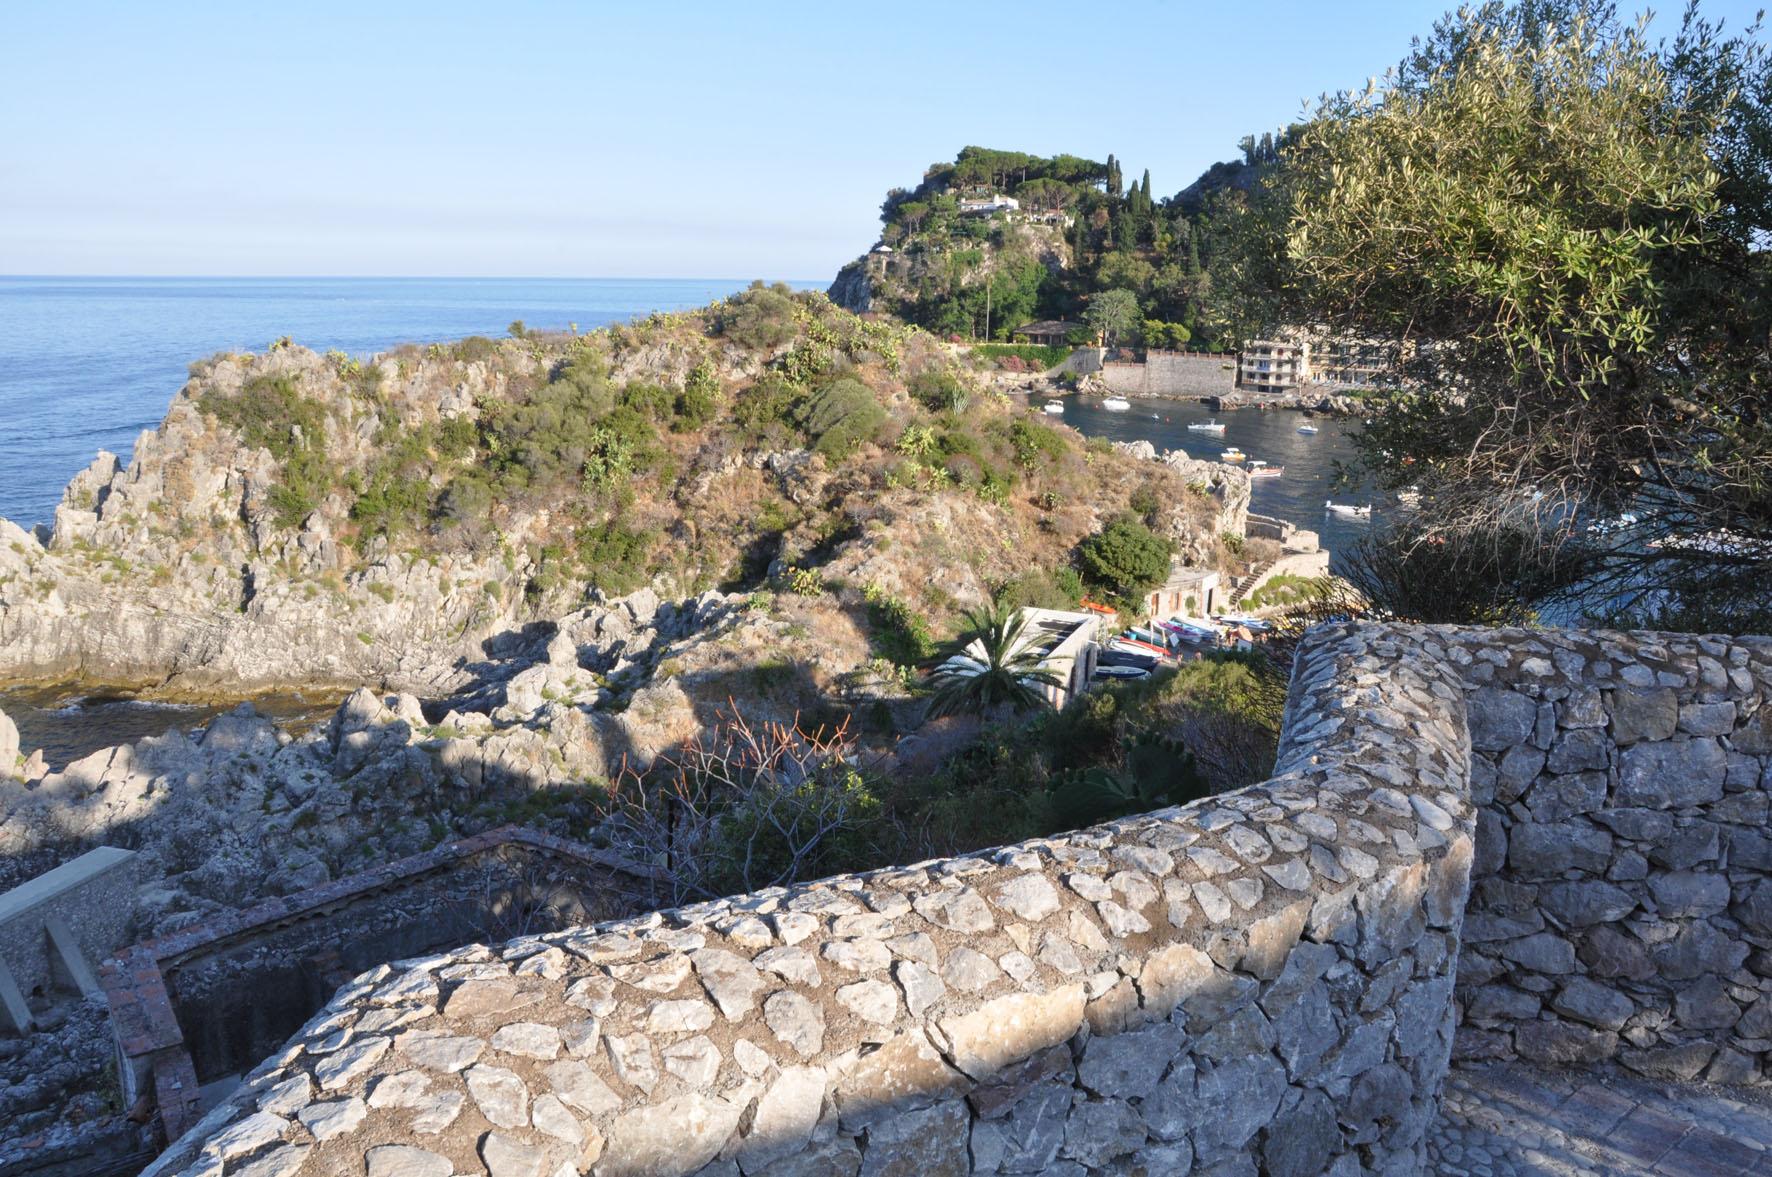 Le Rocce Capo Mazzarò Taormina